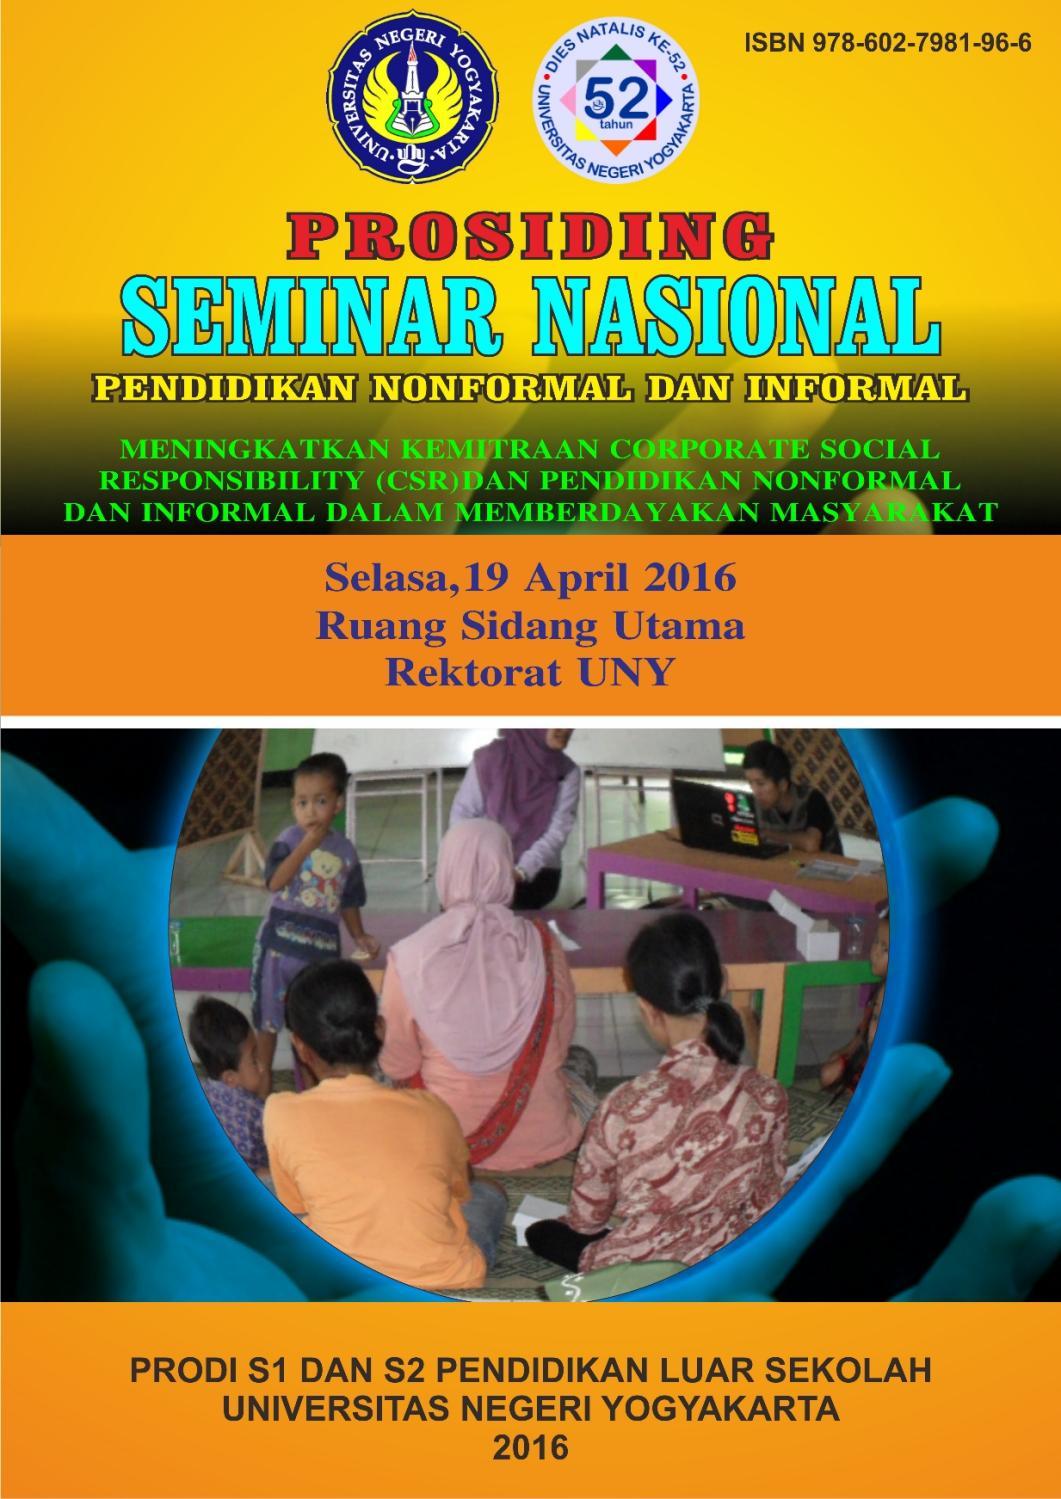 Prosiding Seminar Csr Cover Dan Isi Tanpa Materi Narasumber Hal Rkb Tegal Madu Mongso Awal By Elsa Sakarin Issuu